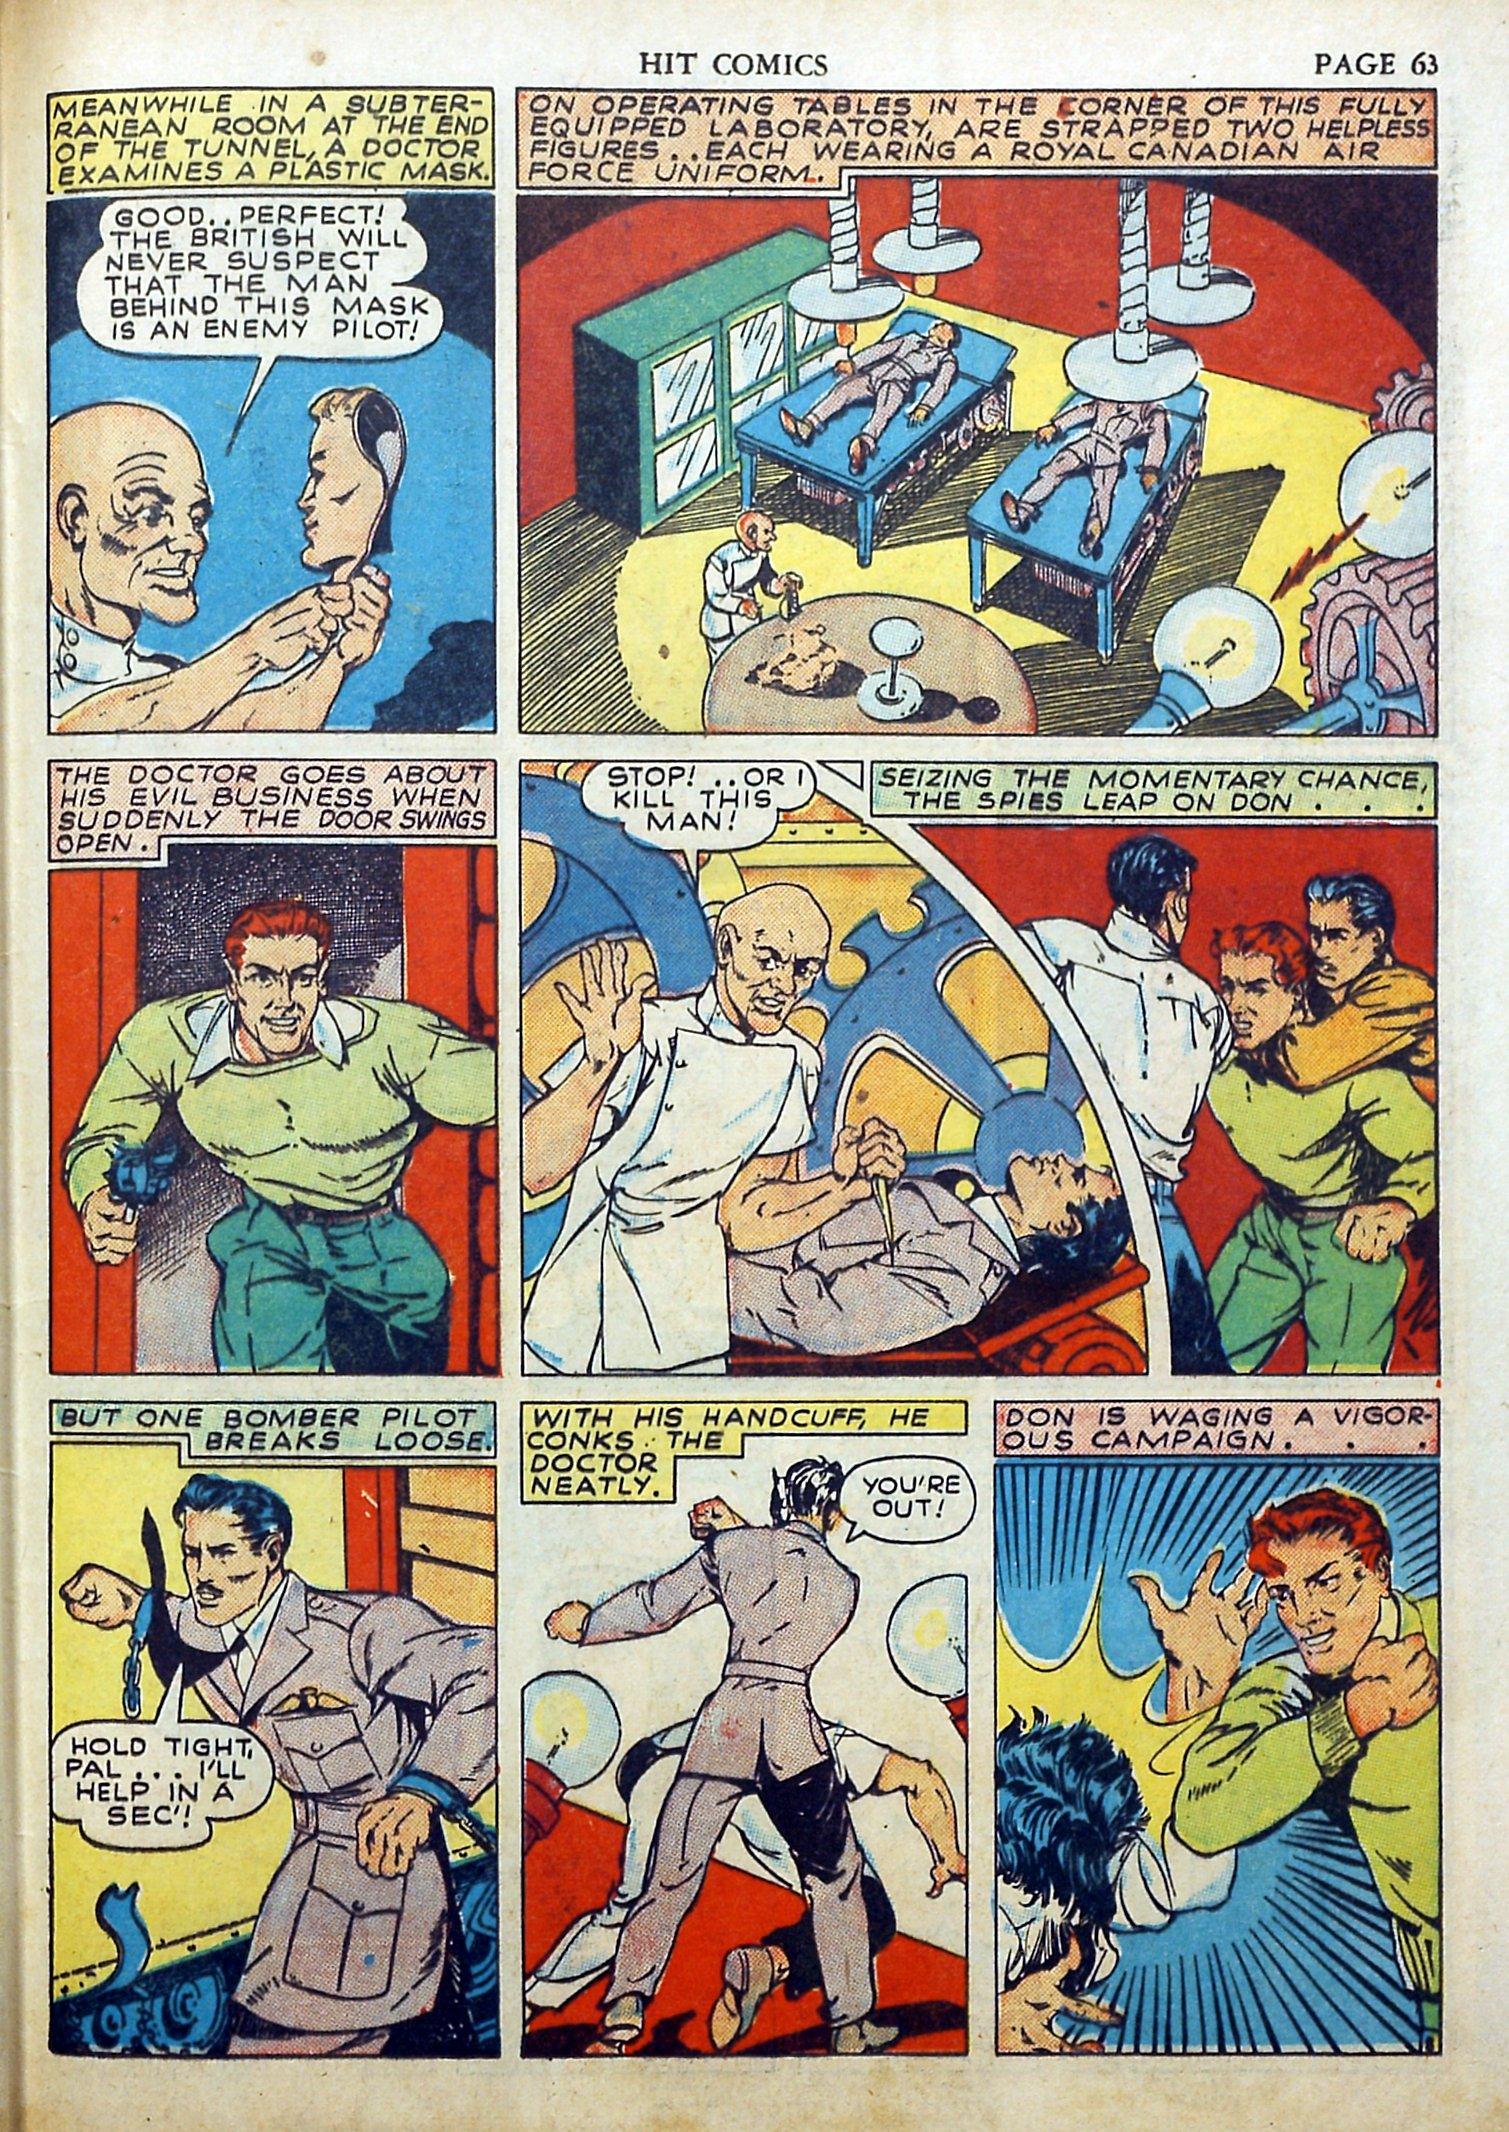 Read online Hit Comics comic -  Issue #17 - 65